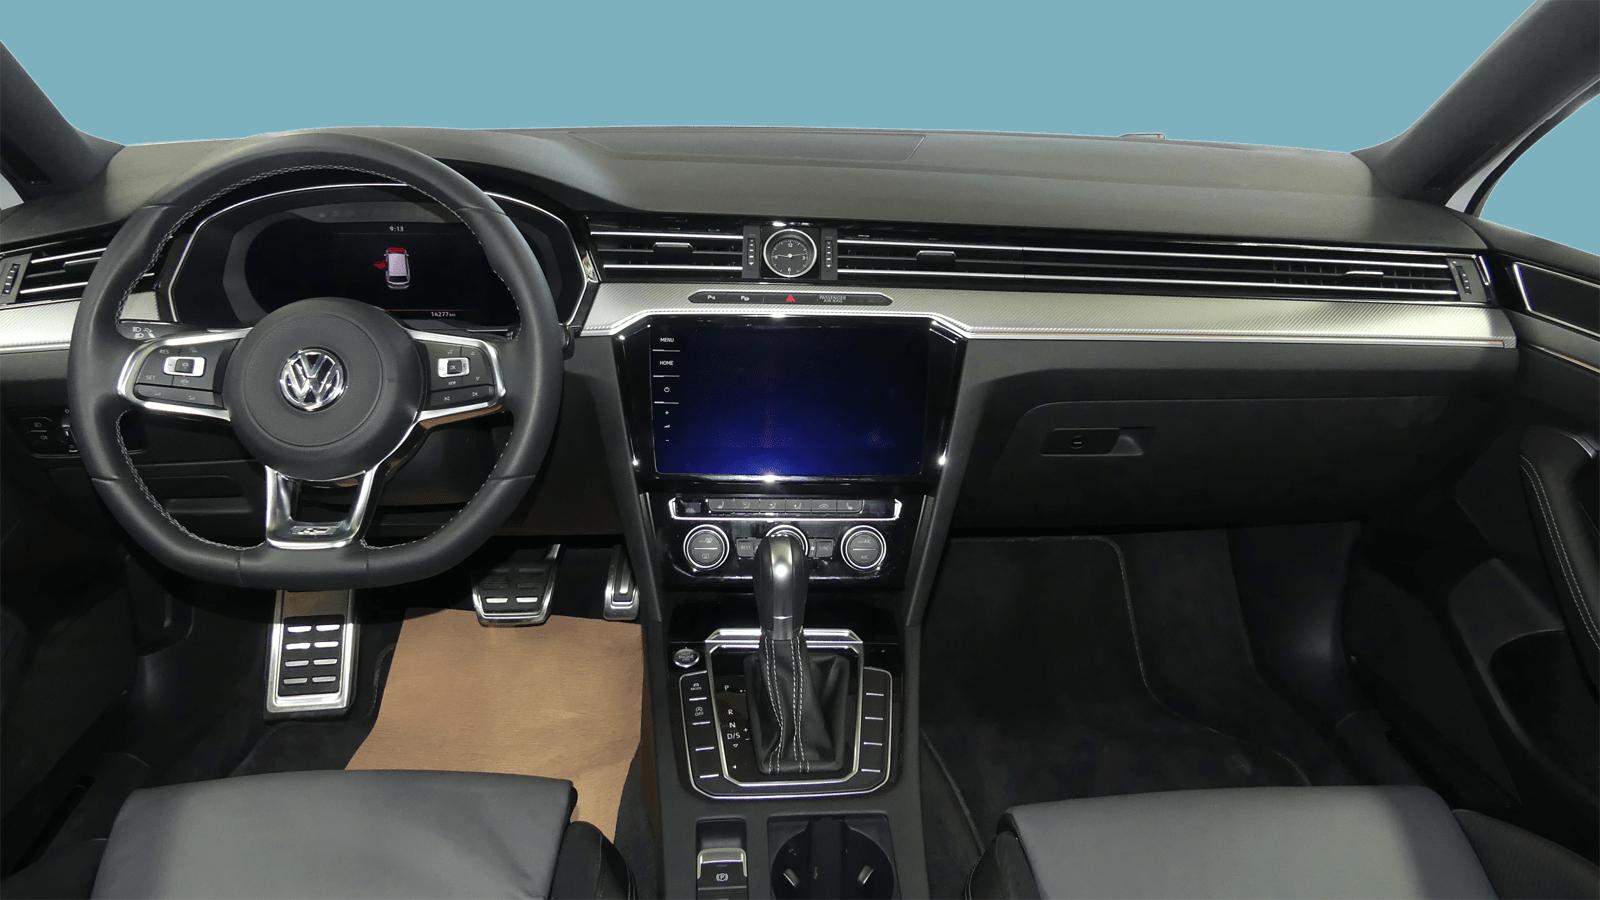 VW Passat Variant Weiss interior - Clyde Auto-Abo